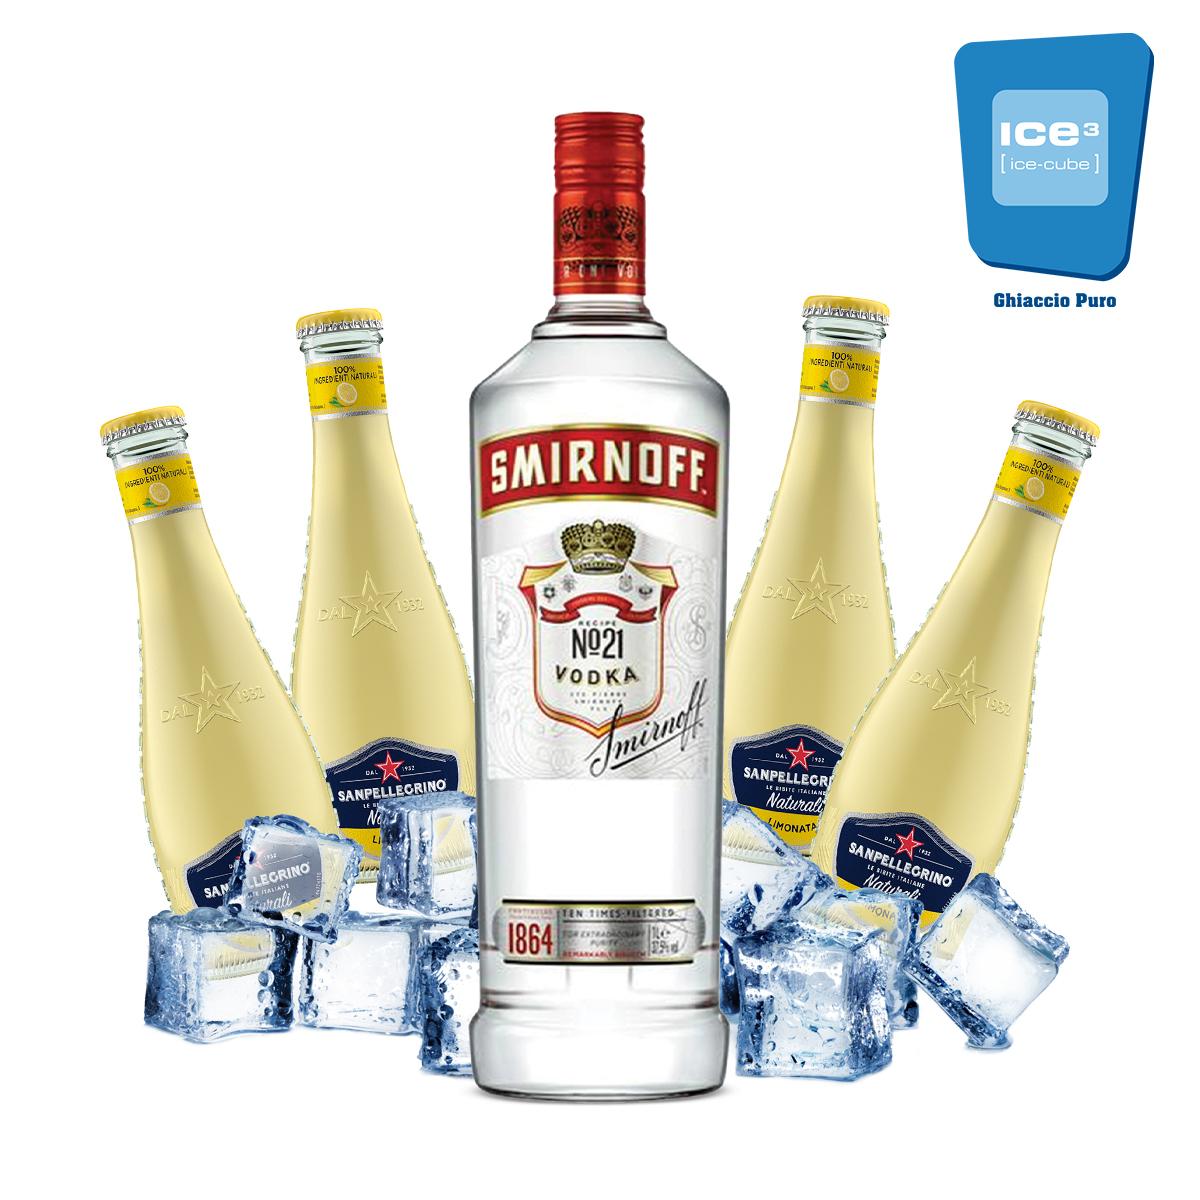 Smirnoff - Vodka Lemon Kit - per 10 persone